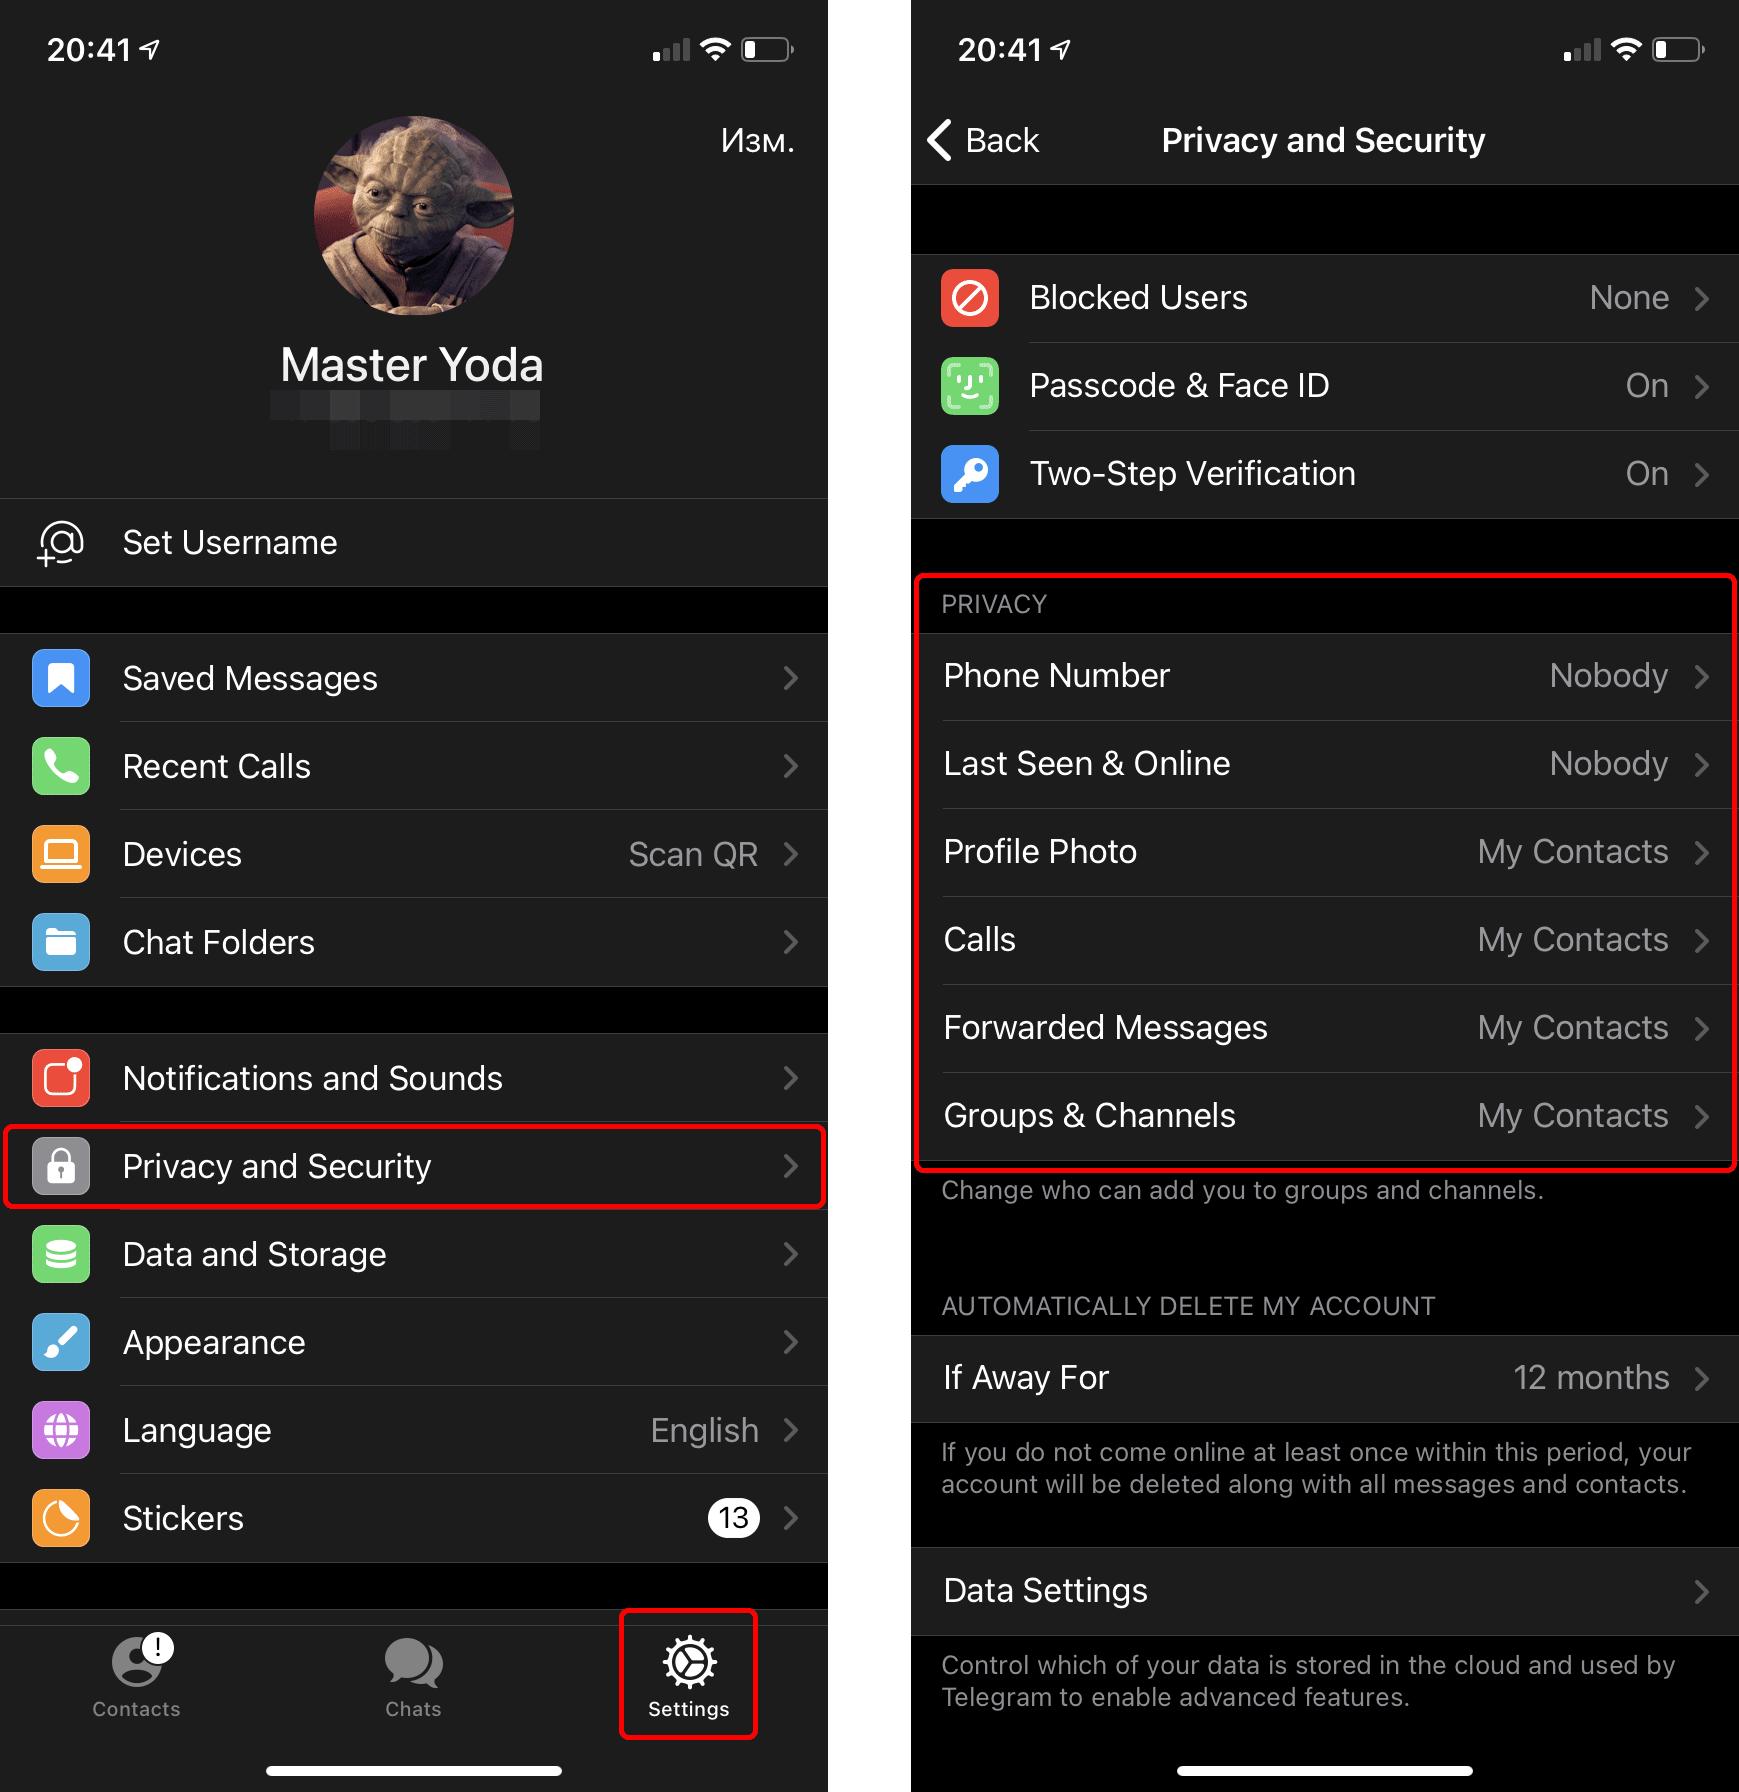 como configurar a privacidade do seu Telegram